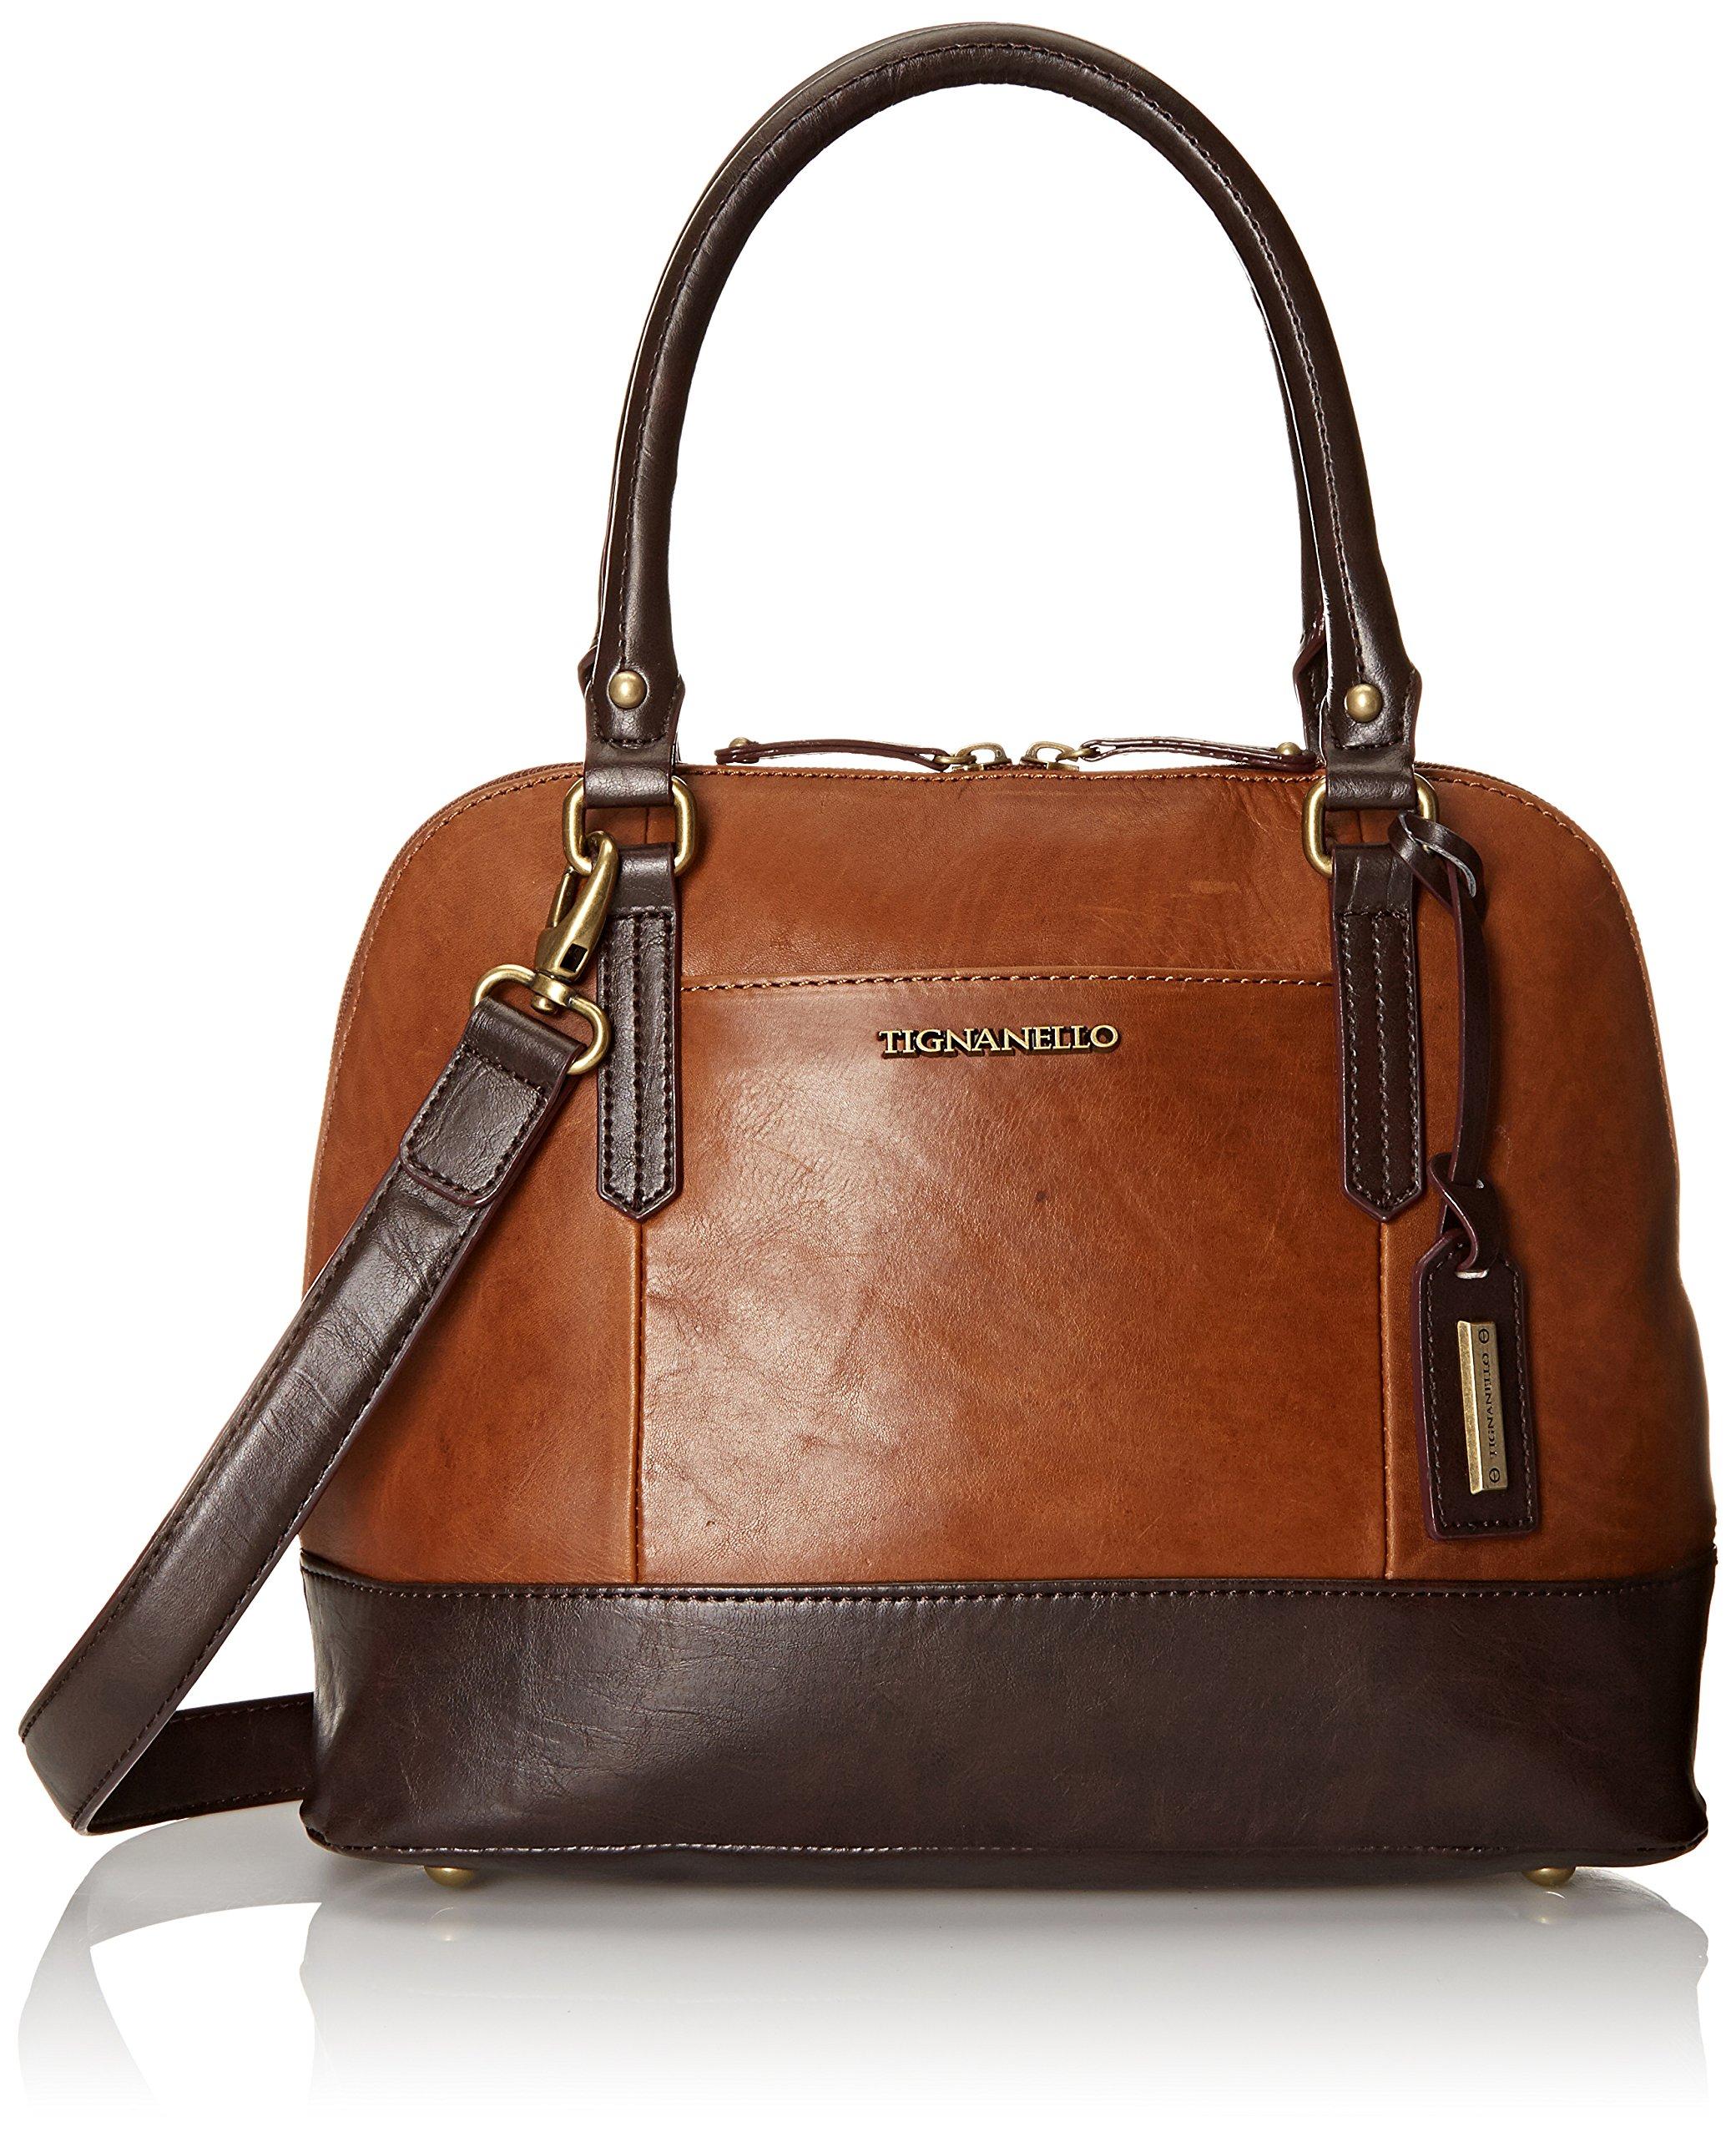 Tignanello Vintage Leather Accordian Satchel Shoulder Bag, Walnut, One Size